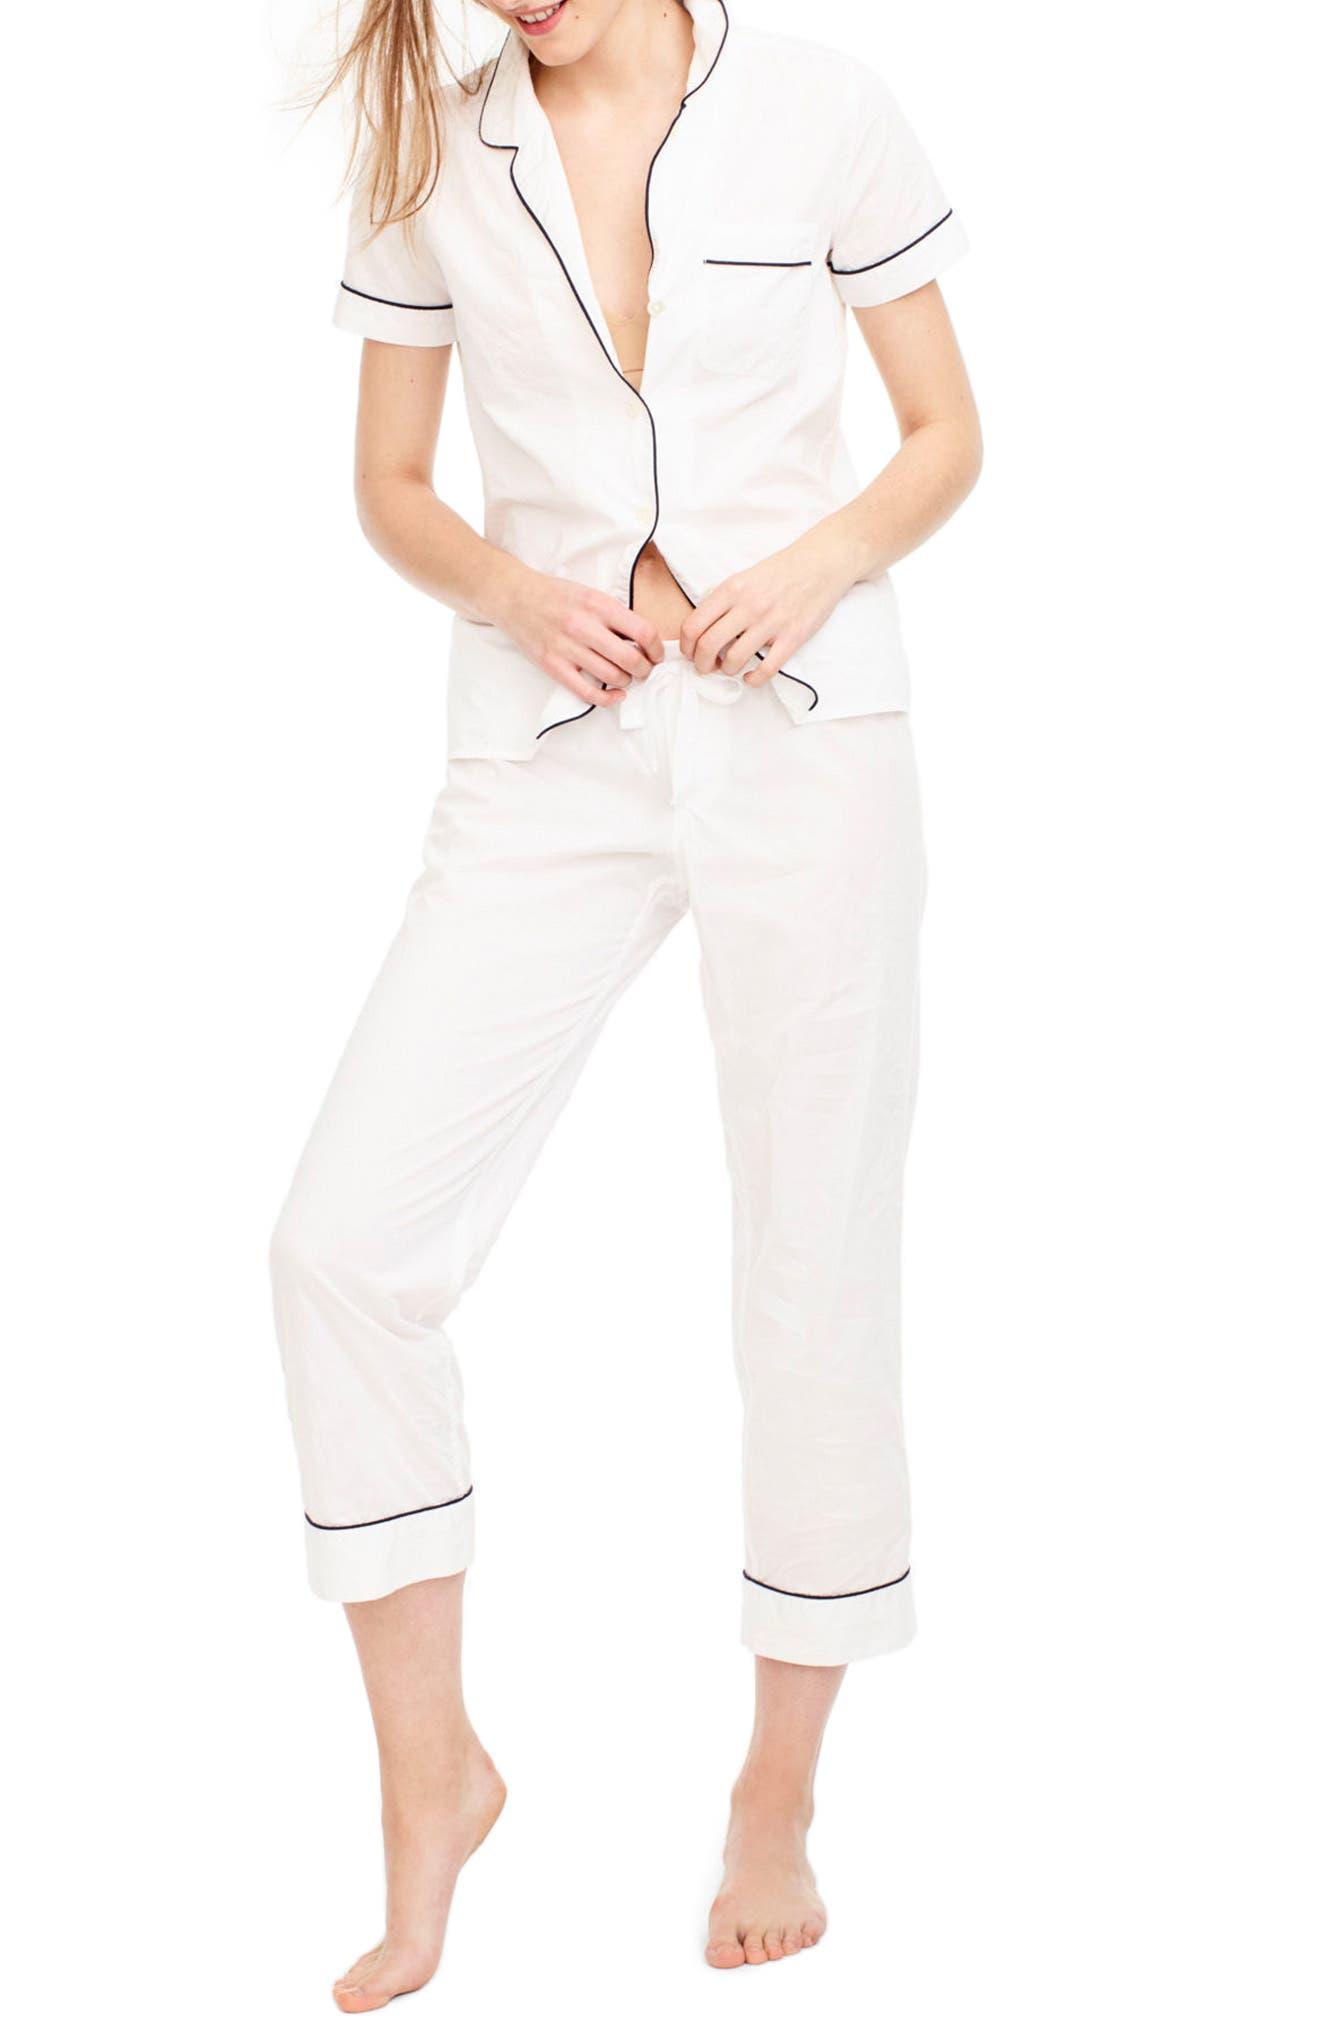 J.Crew Vintage Cotton Pajamas,                             Main thumbnail 1, color,                             White